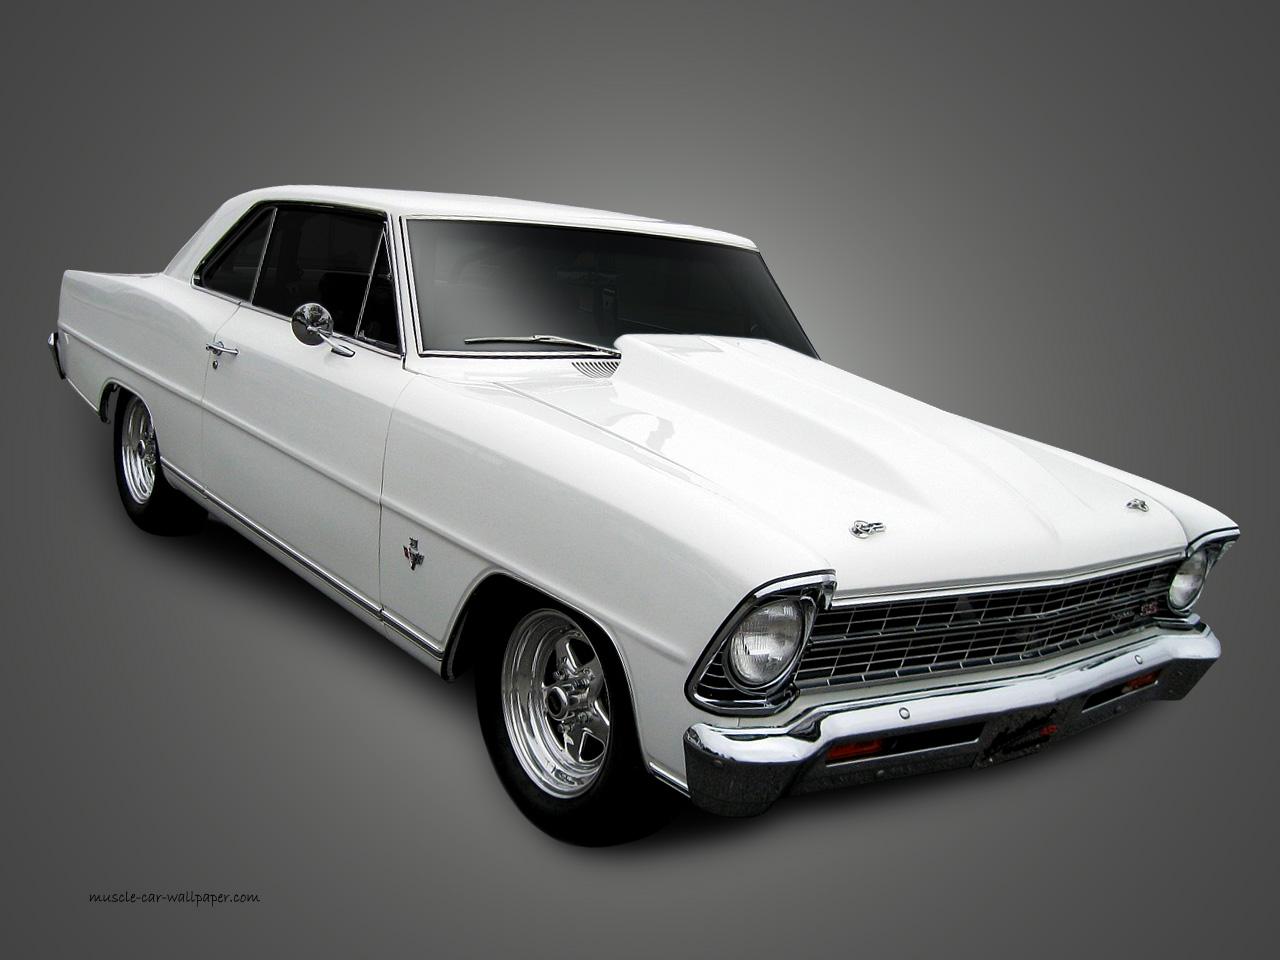 1967 Chevy Nova Wallpaper Muscle Car Wallpaper 1280x960